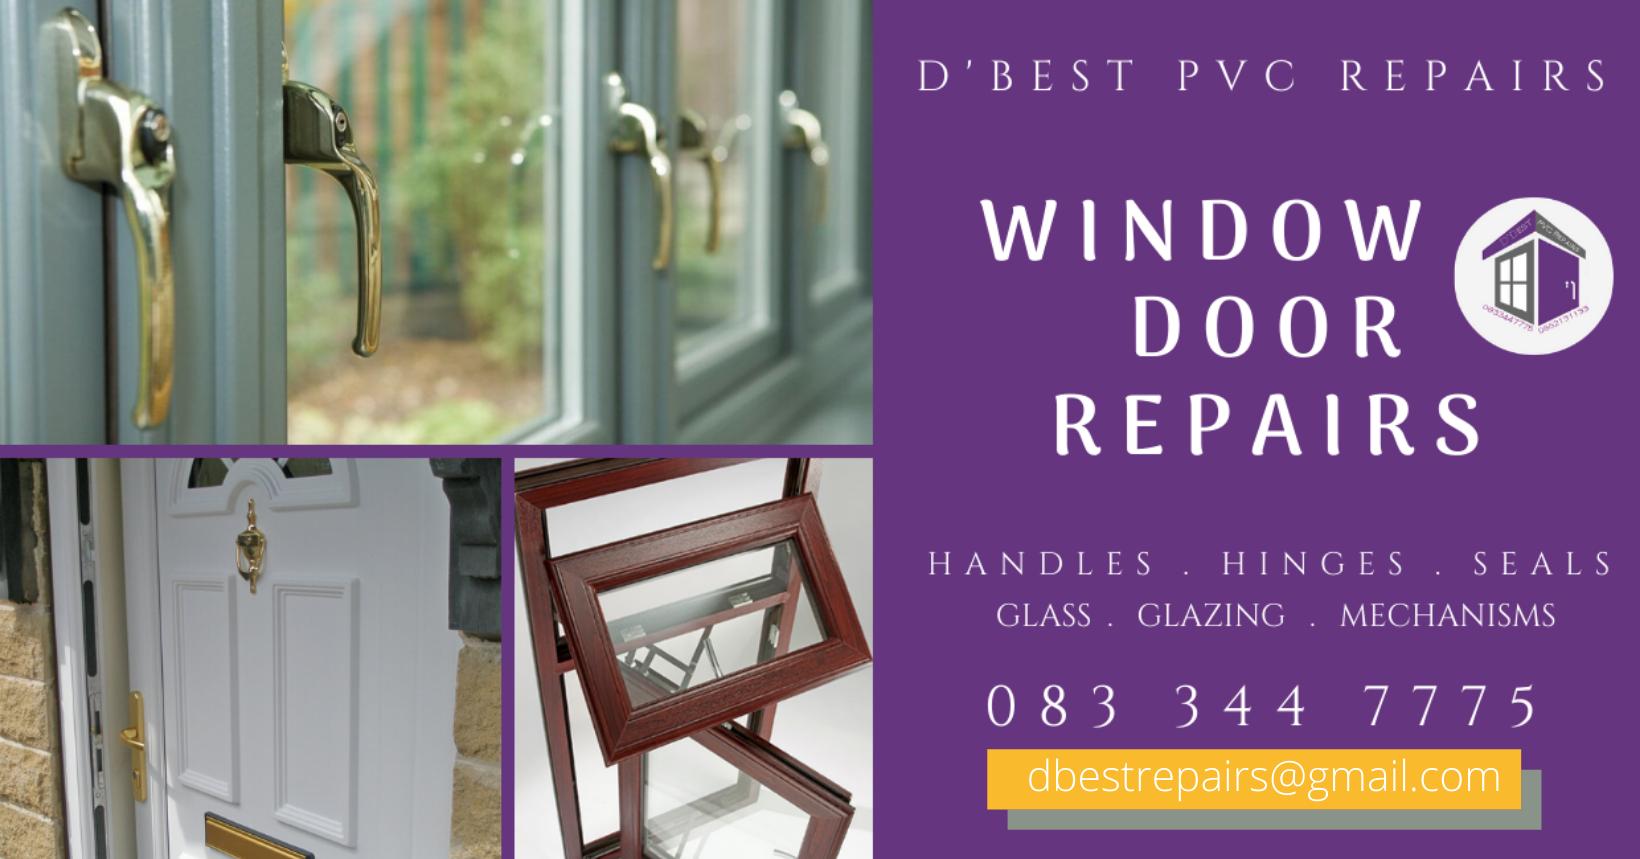 PVC Window and Door Repairs dublin Westmeath Meath Longford Cavan Leitrim and Roscommon